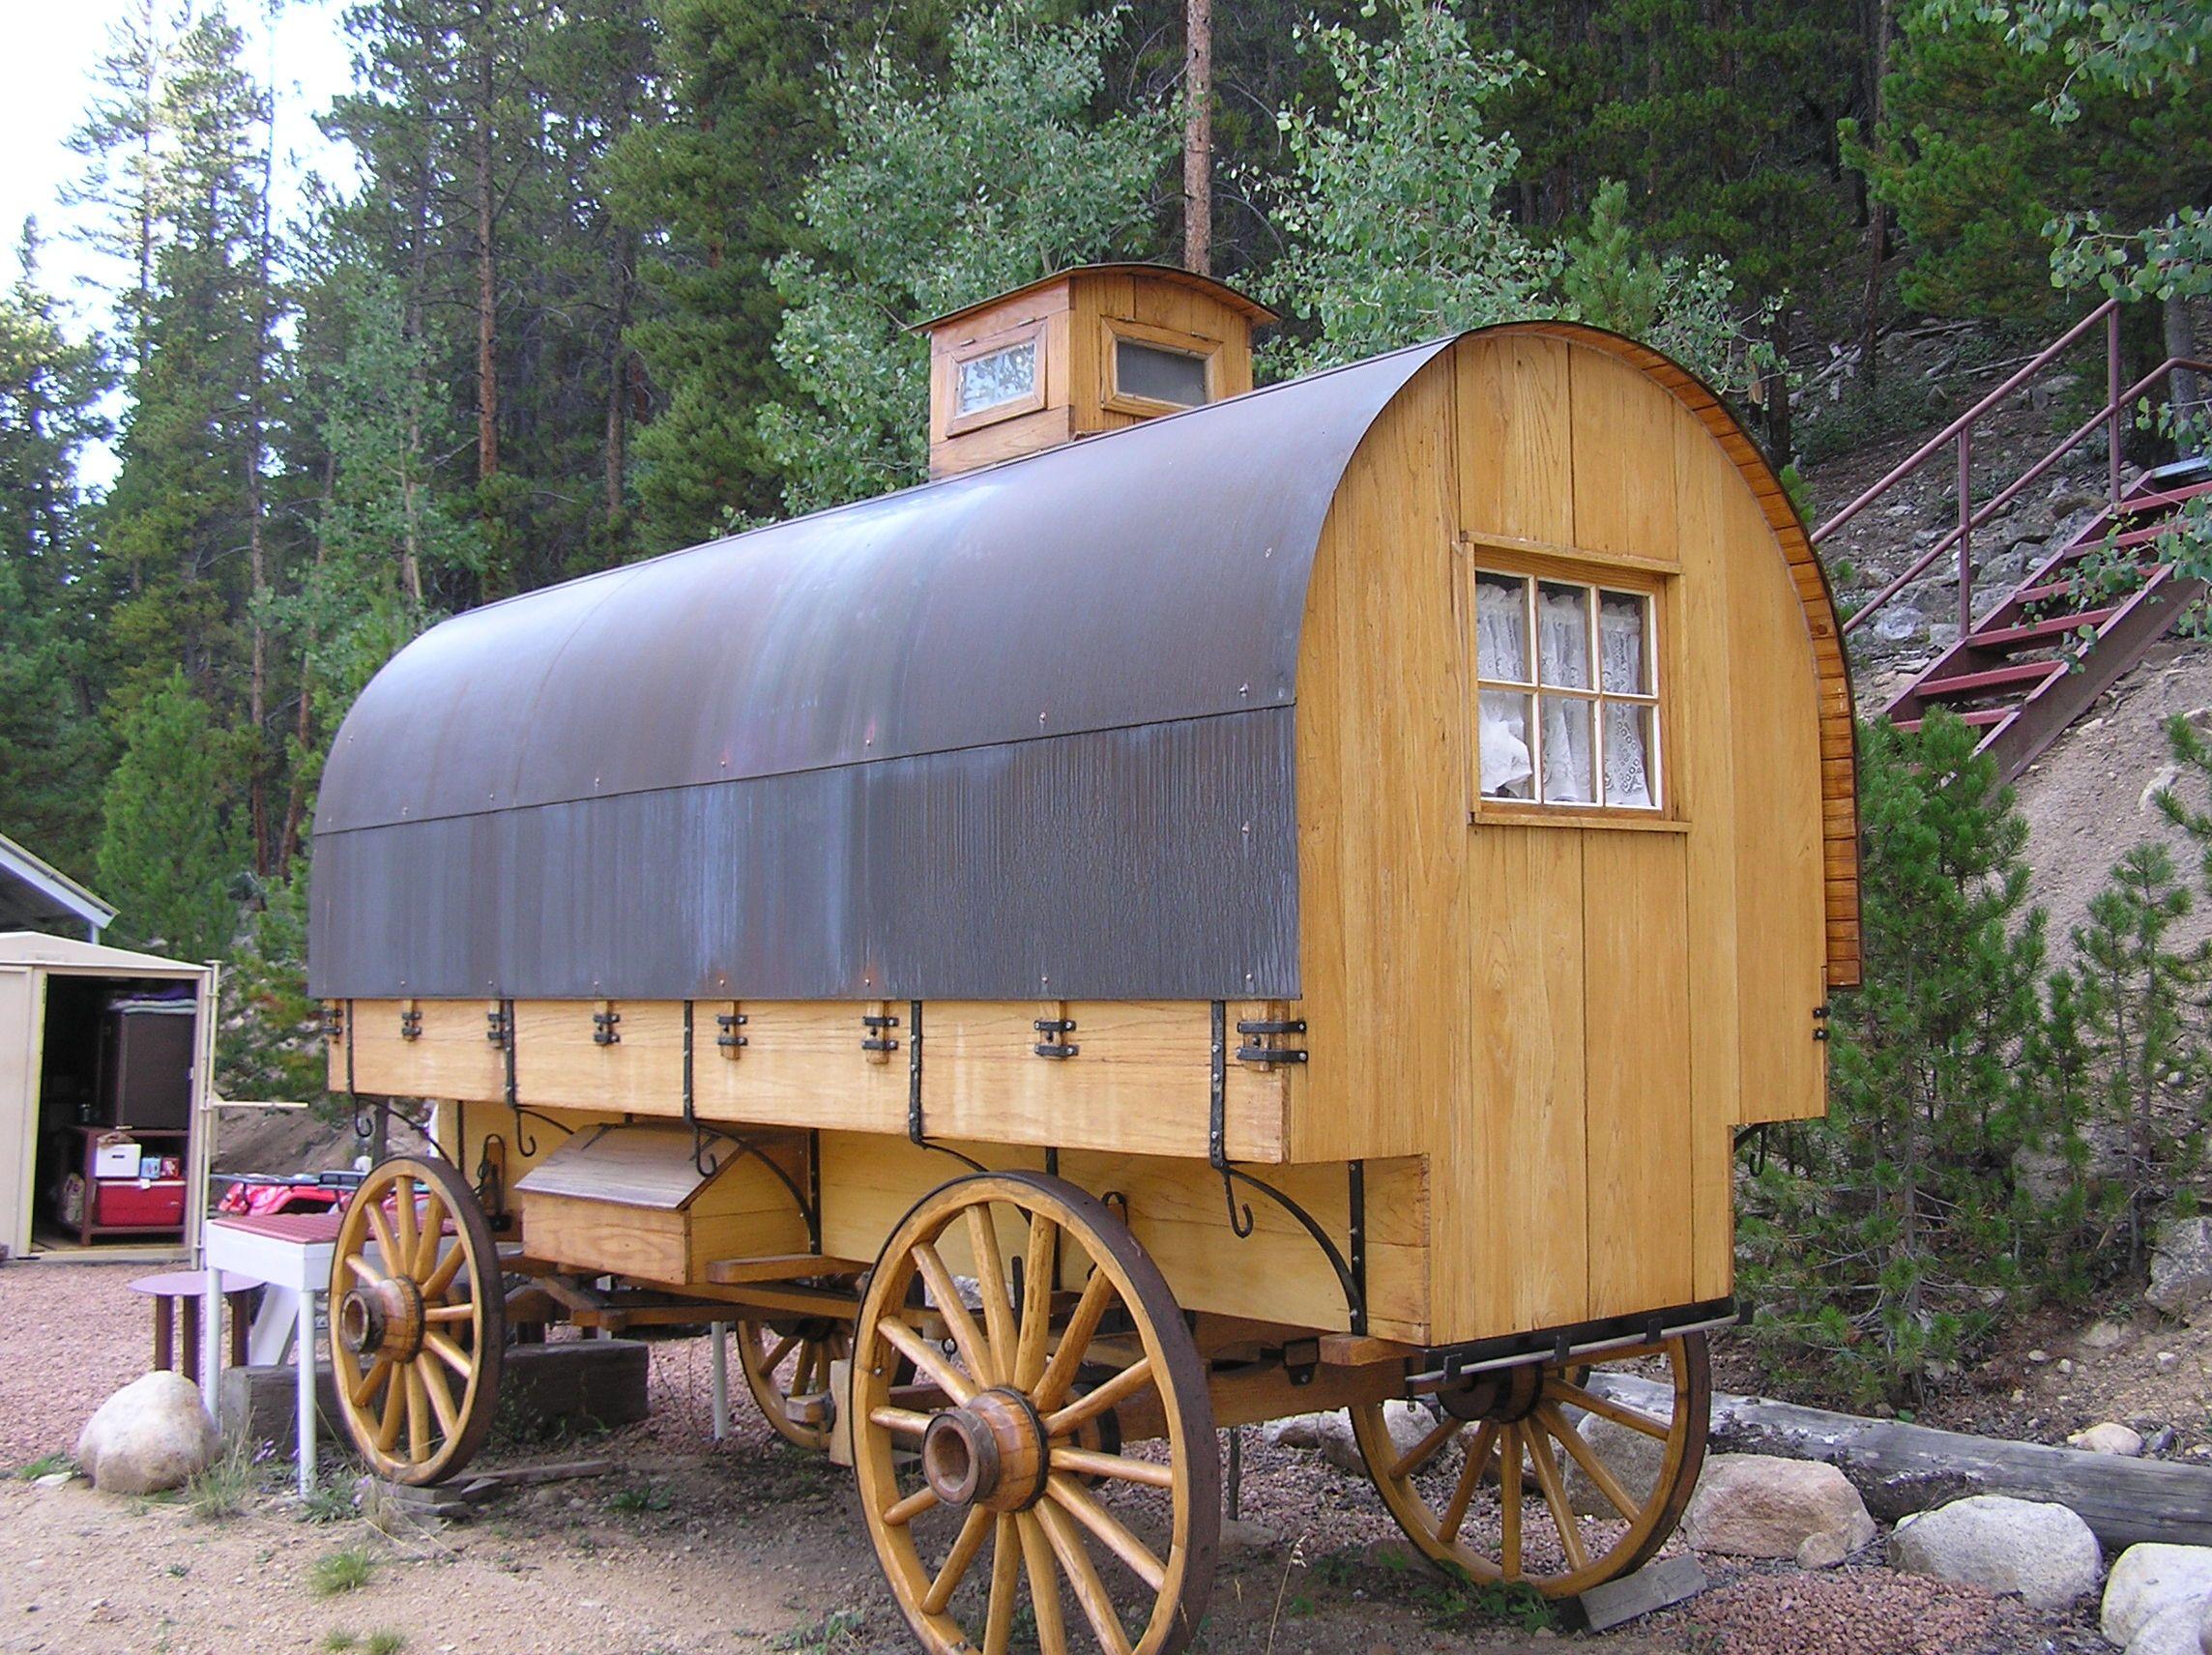 copper top sheep herder 39 s wagon the original travel trailer architecture pinterest. Black Bedroom Furniture Sets. Home Design Ideas